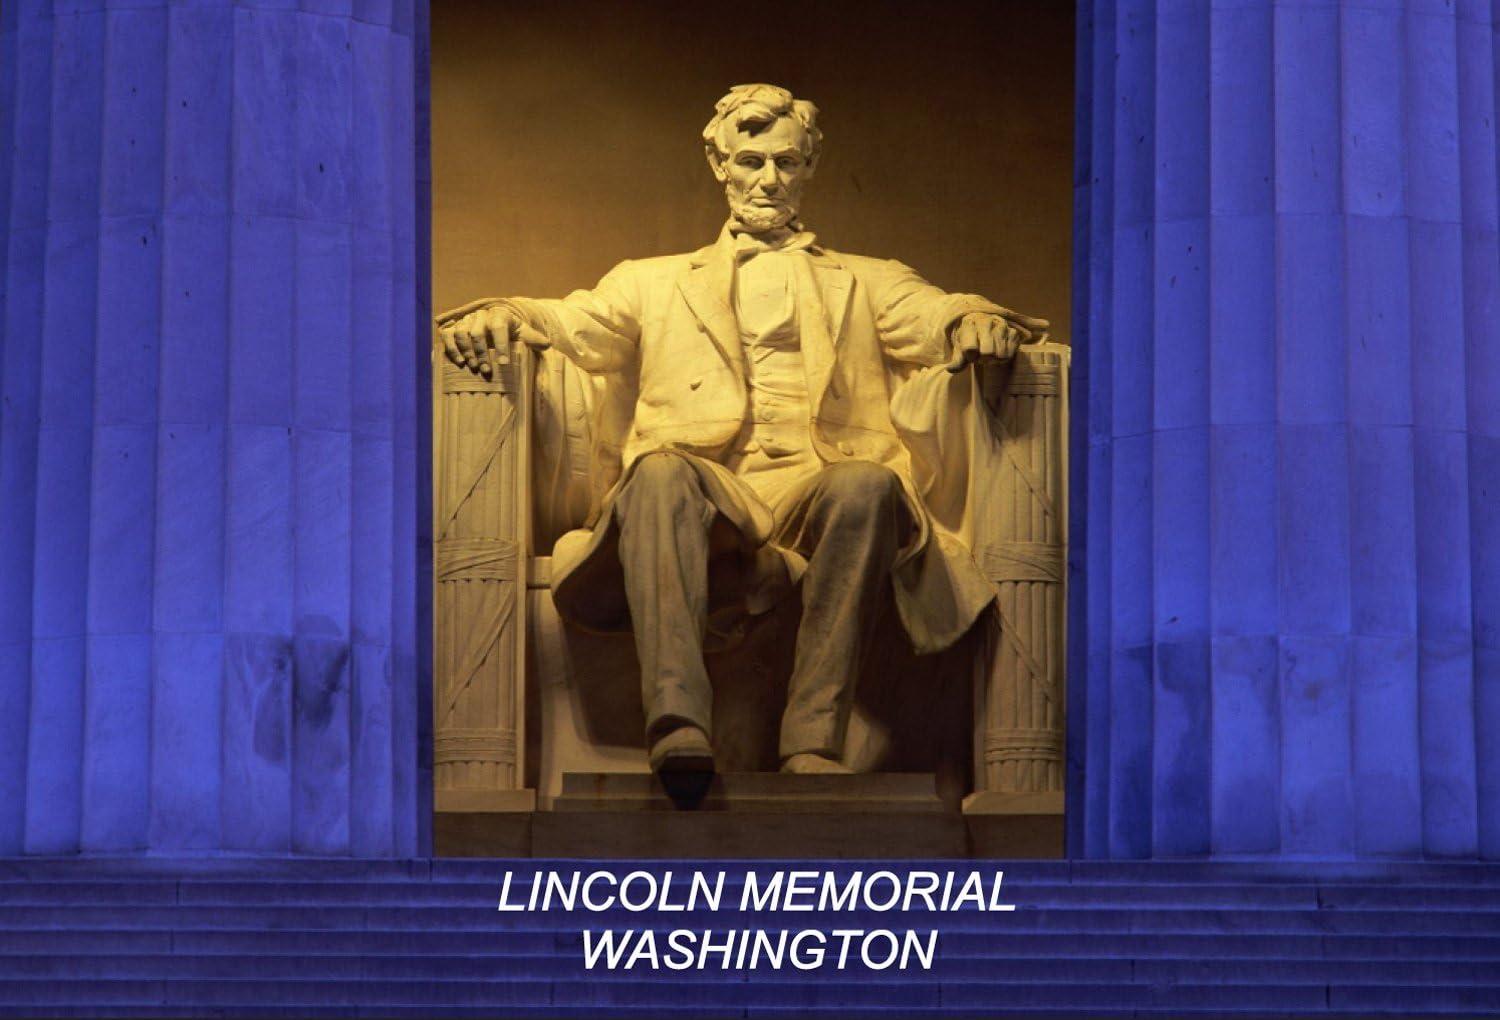 DC District of Columbia USA United States Fridge Refrigerator Magnets (City: Lincoln Memorial Washington #N1)